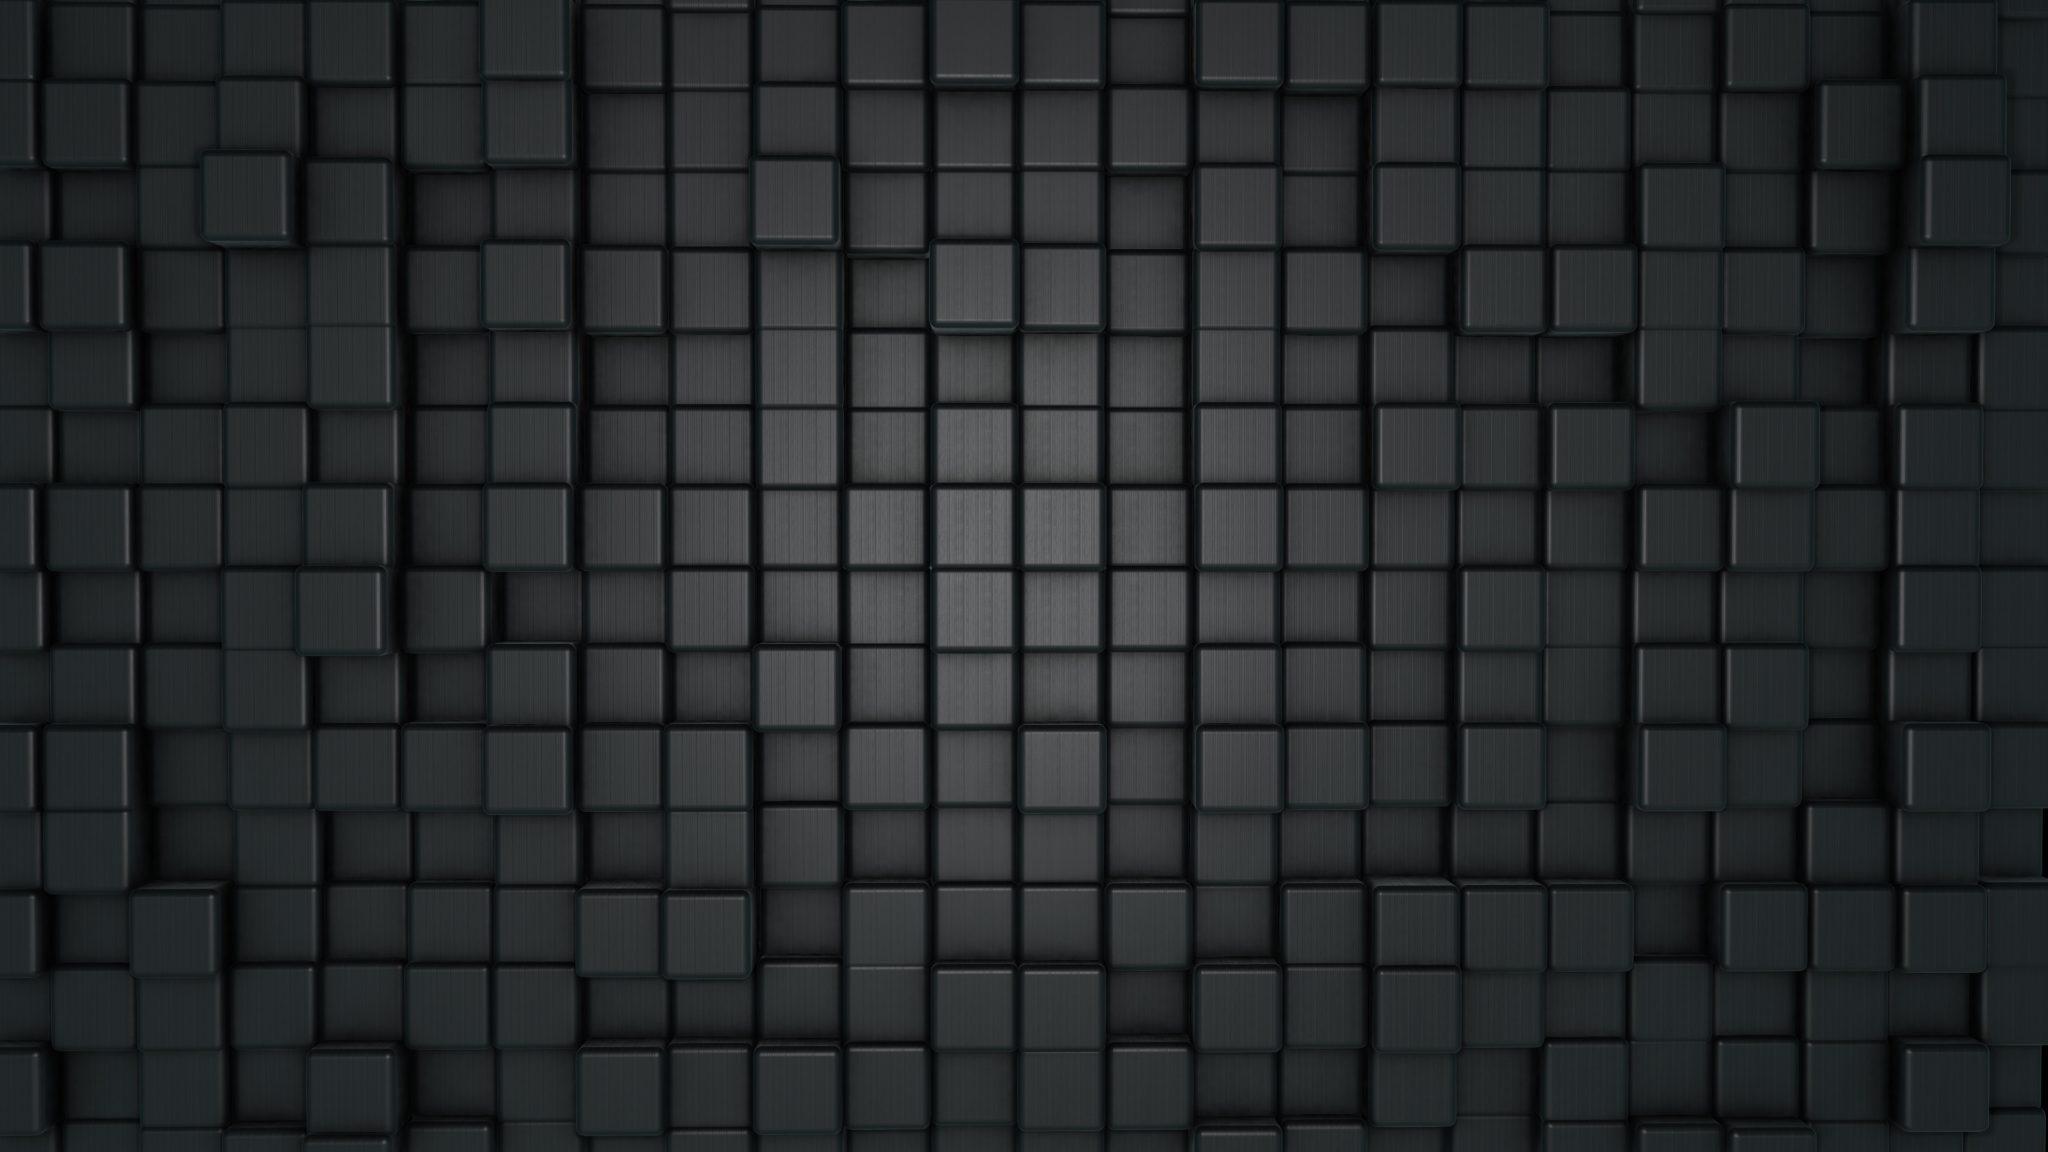 Dunkelgraue Würfel aus mattem Material unsauber angeordnet